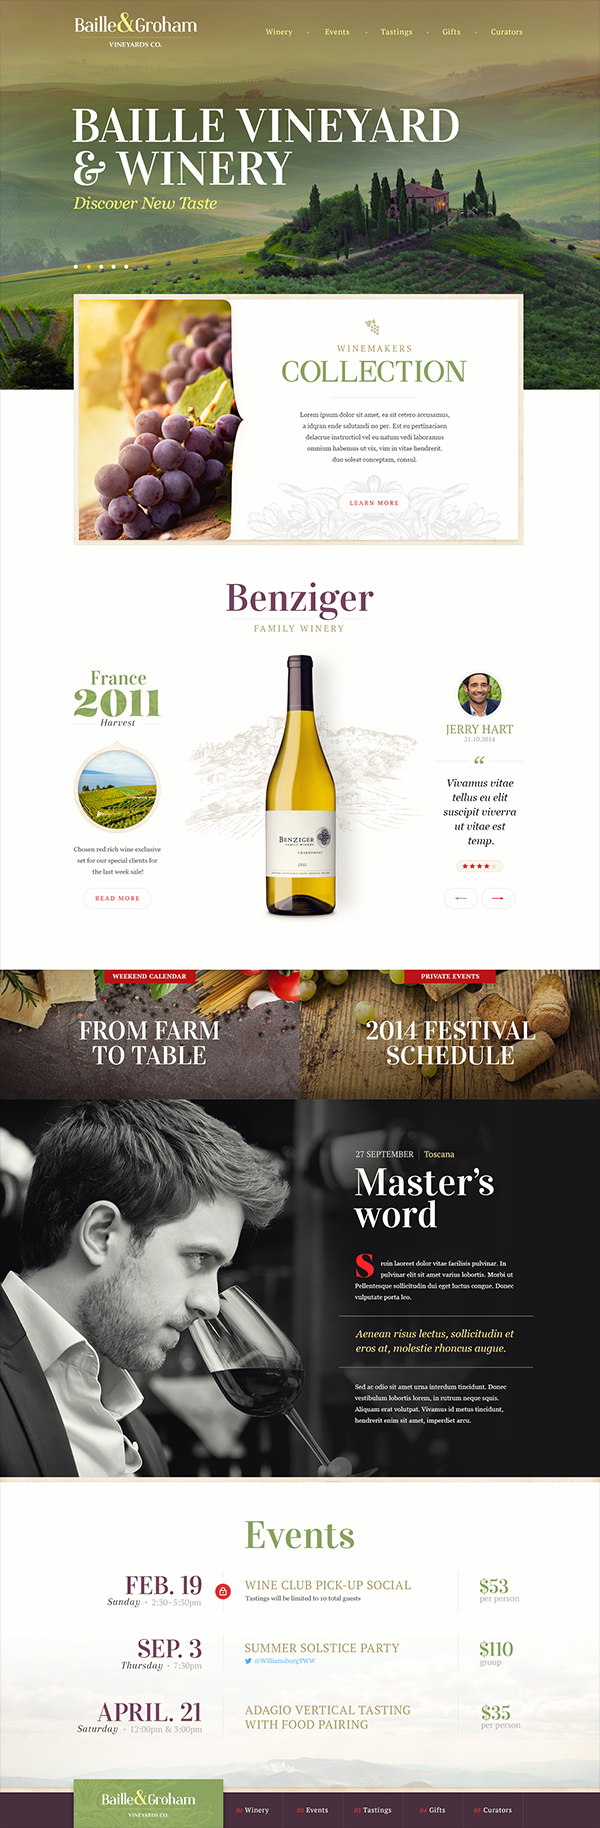 Webdesign site flower cafe hotel wine content navigation Interface button